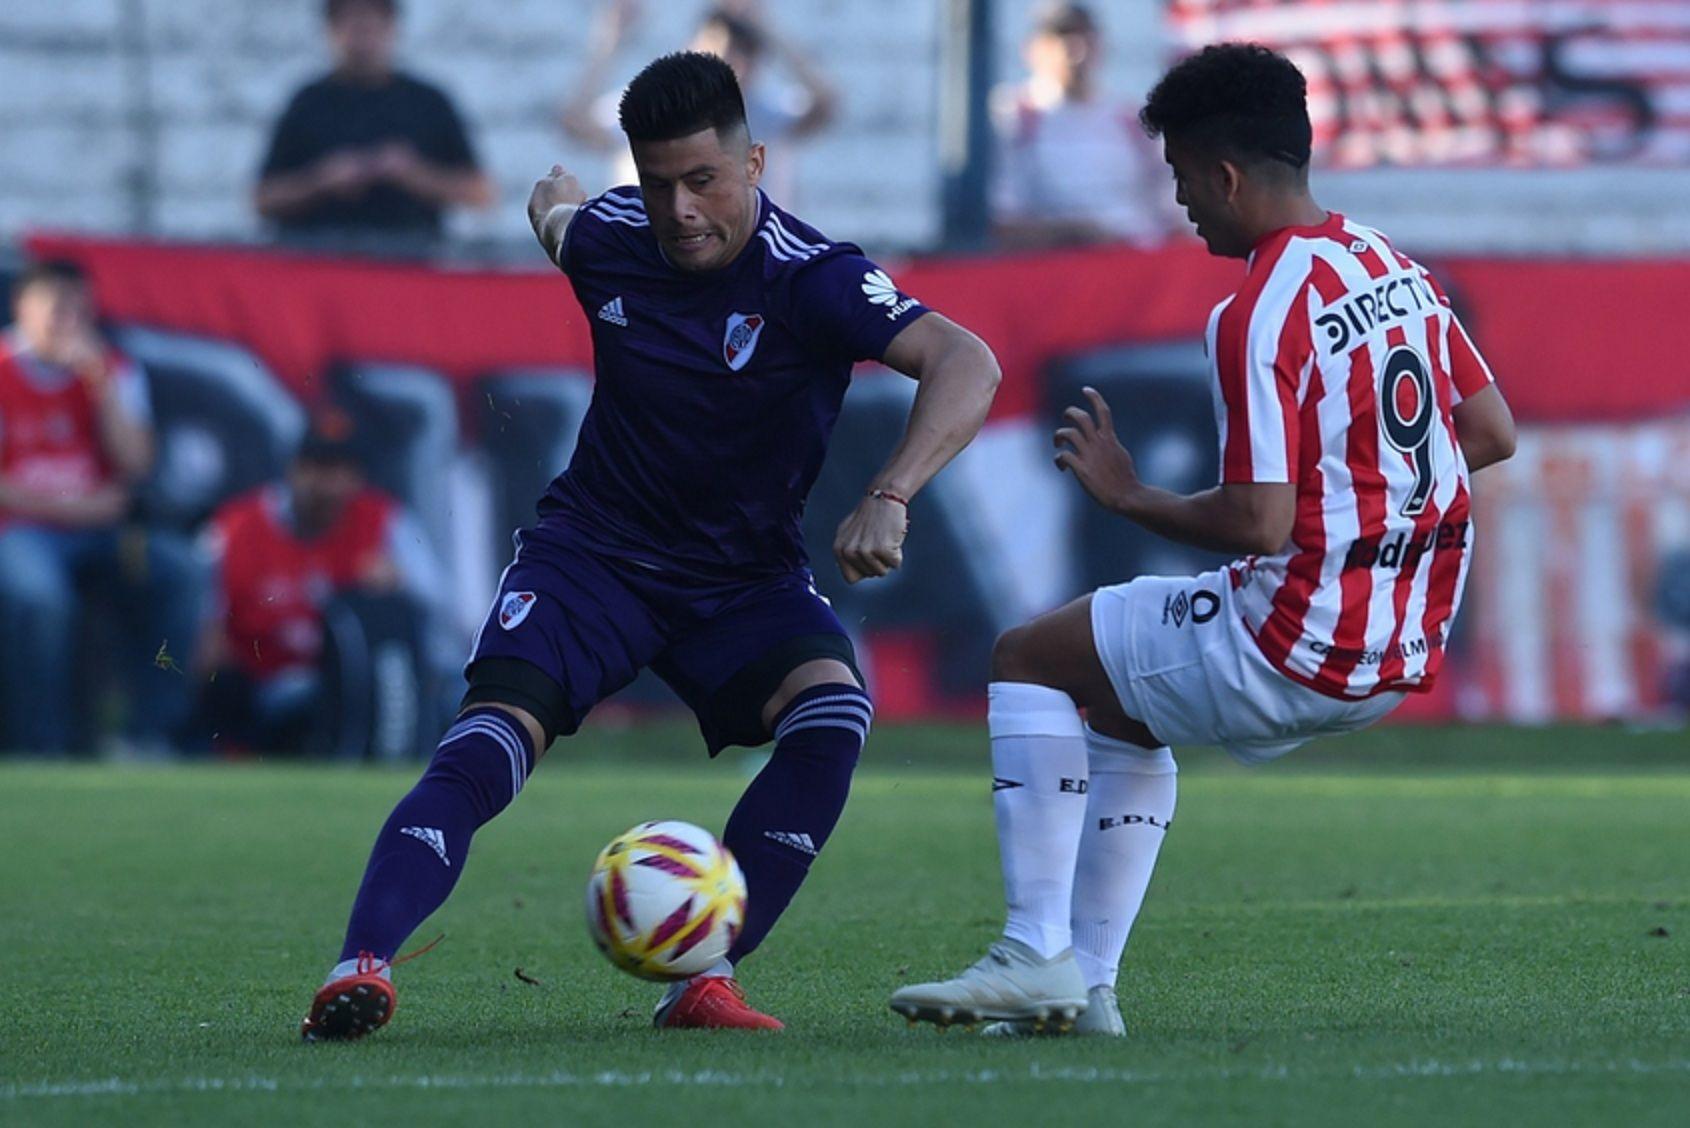 A días de la final de la Copa Libertadores, River perdió con Estudiantes en Quilmes